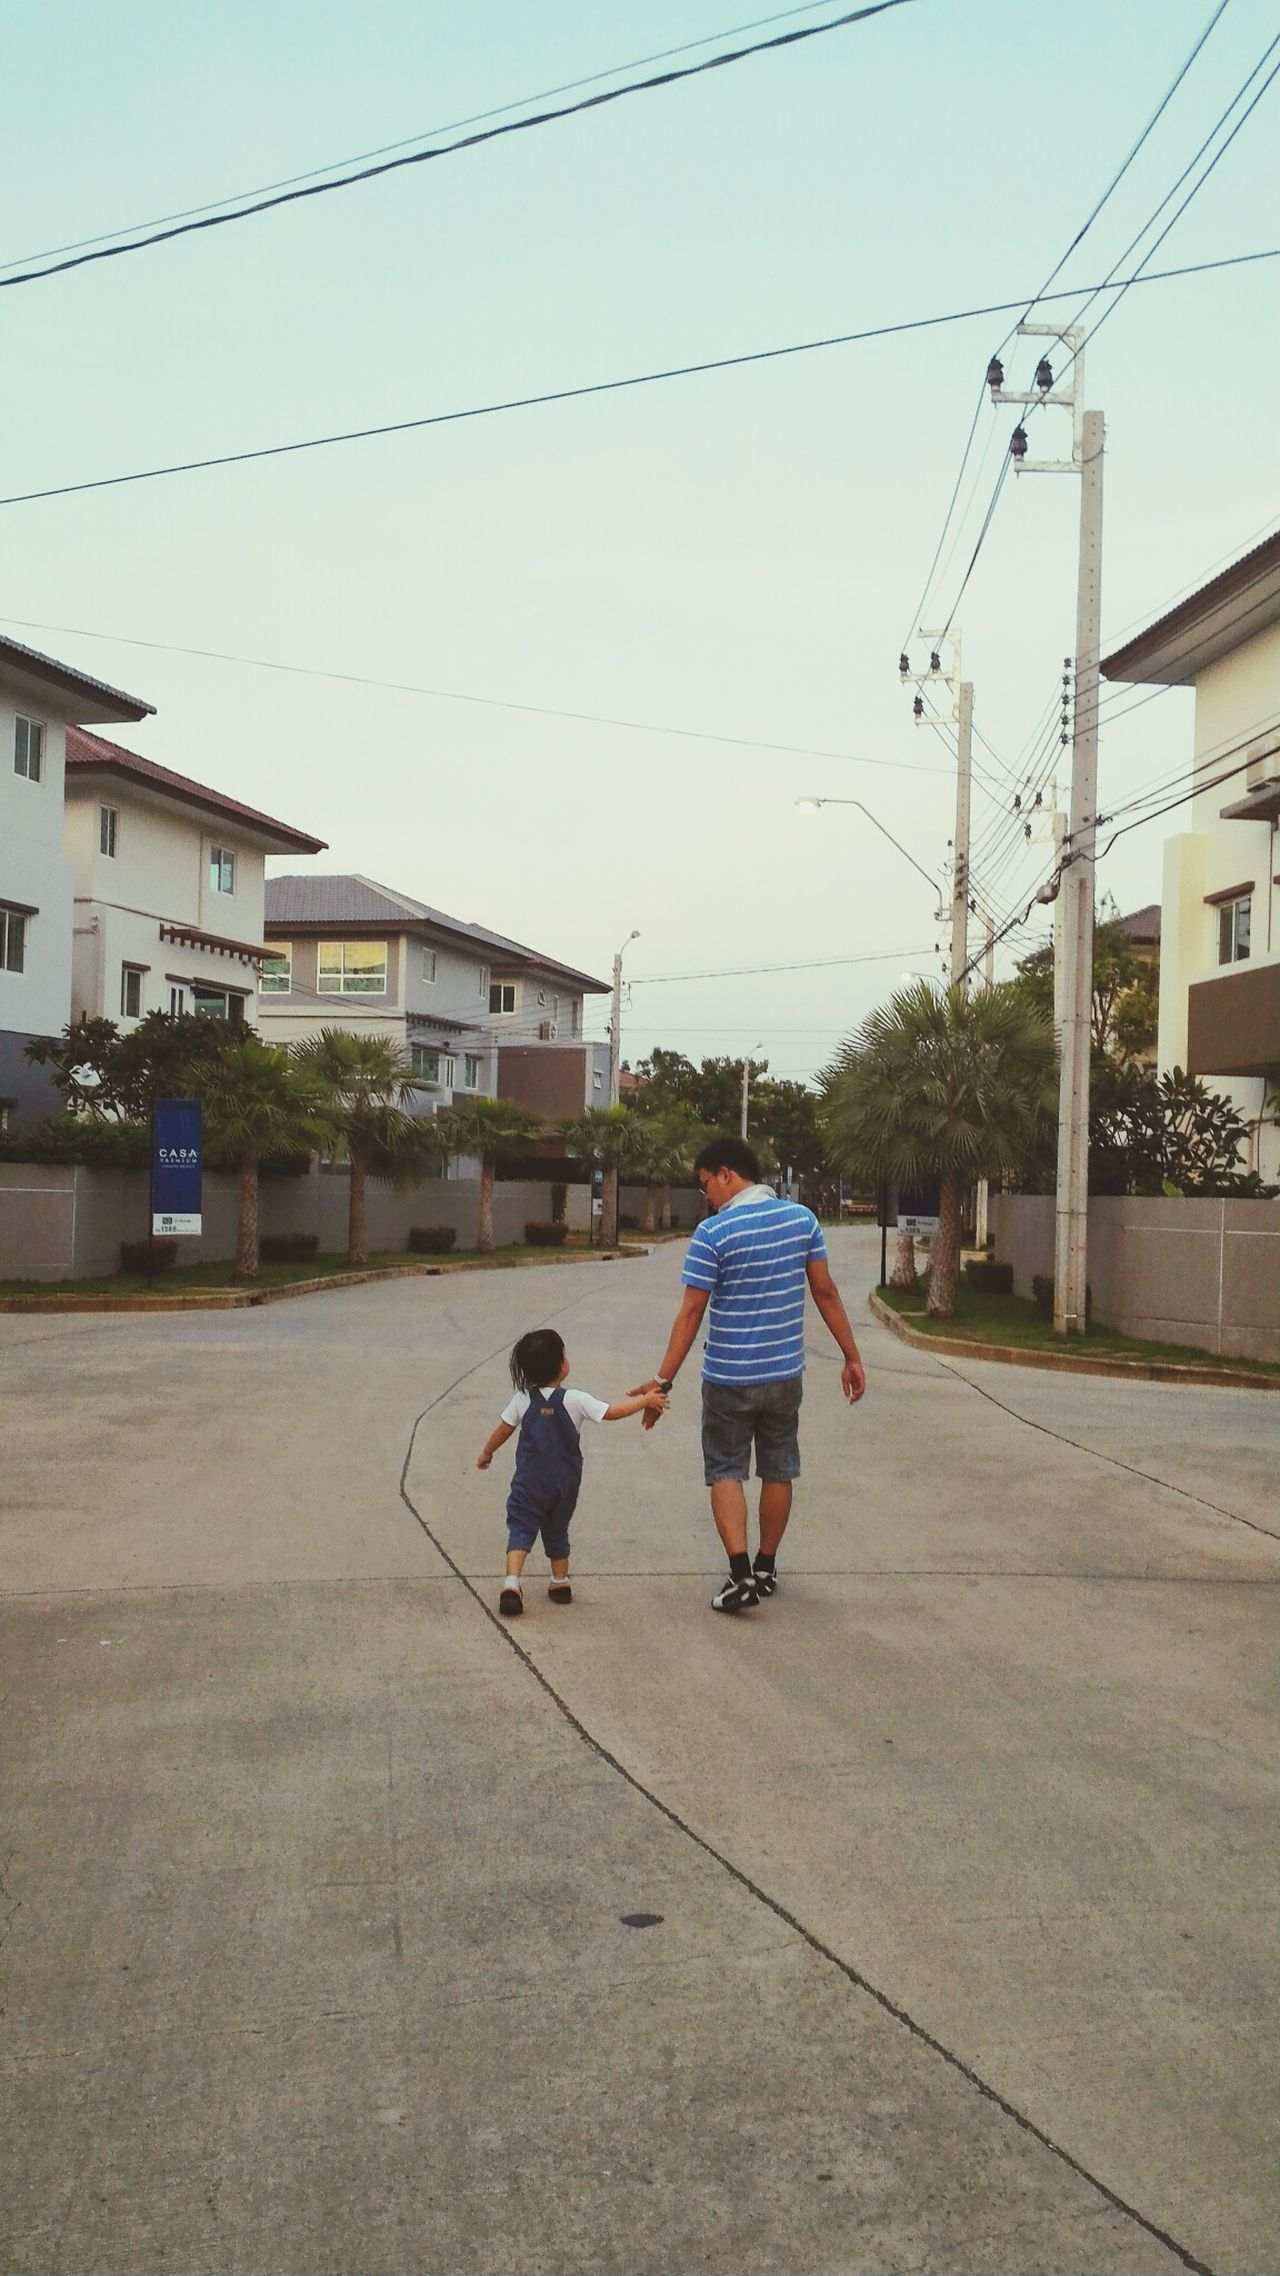 Follow my 2 beloved The Following Followmyboy Take A Walk Father & Son Family My Dad My Hero On The Way